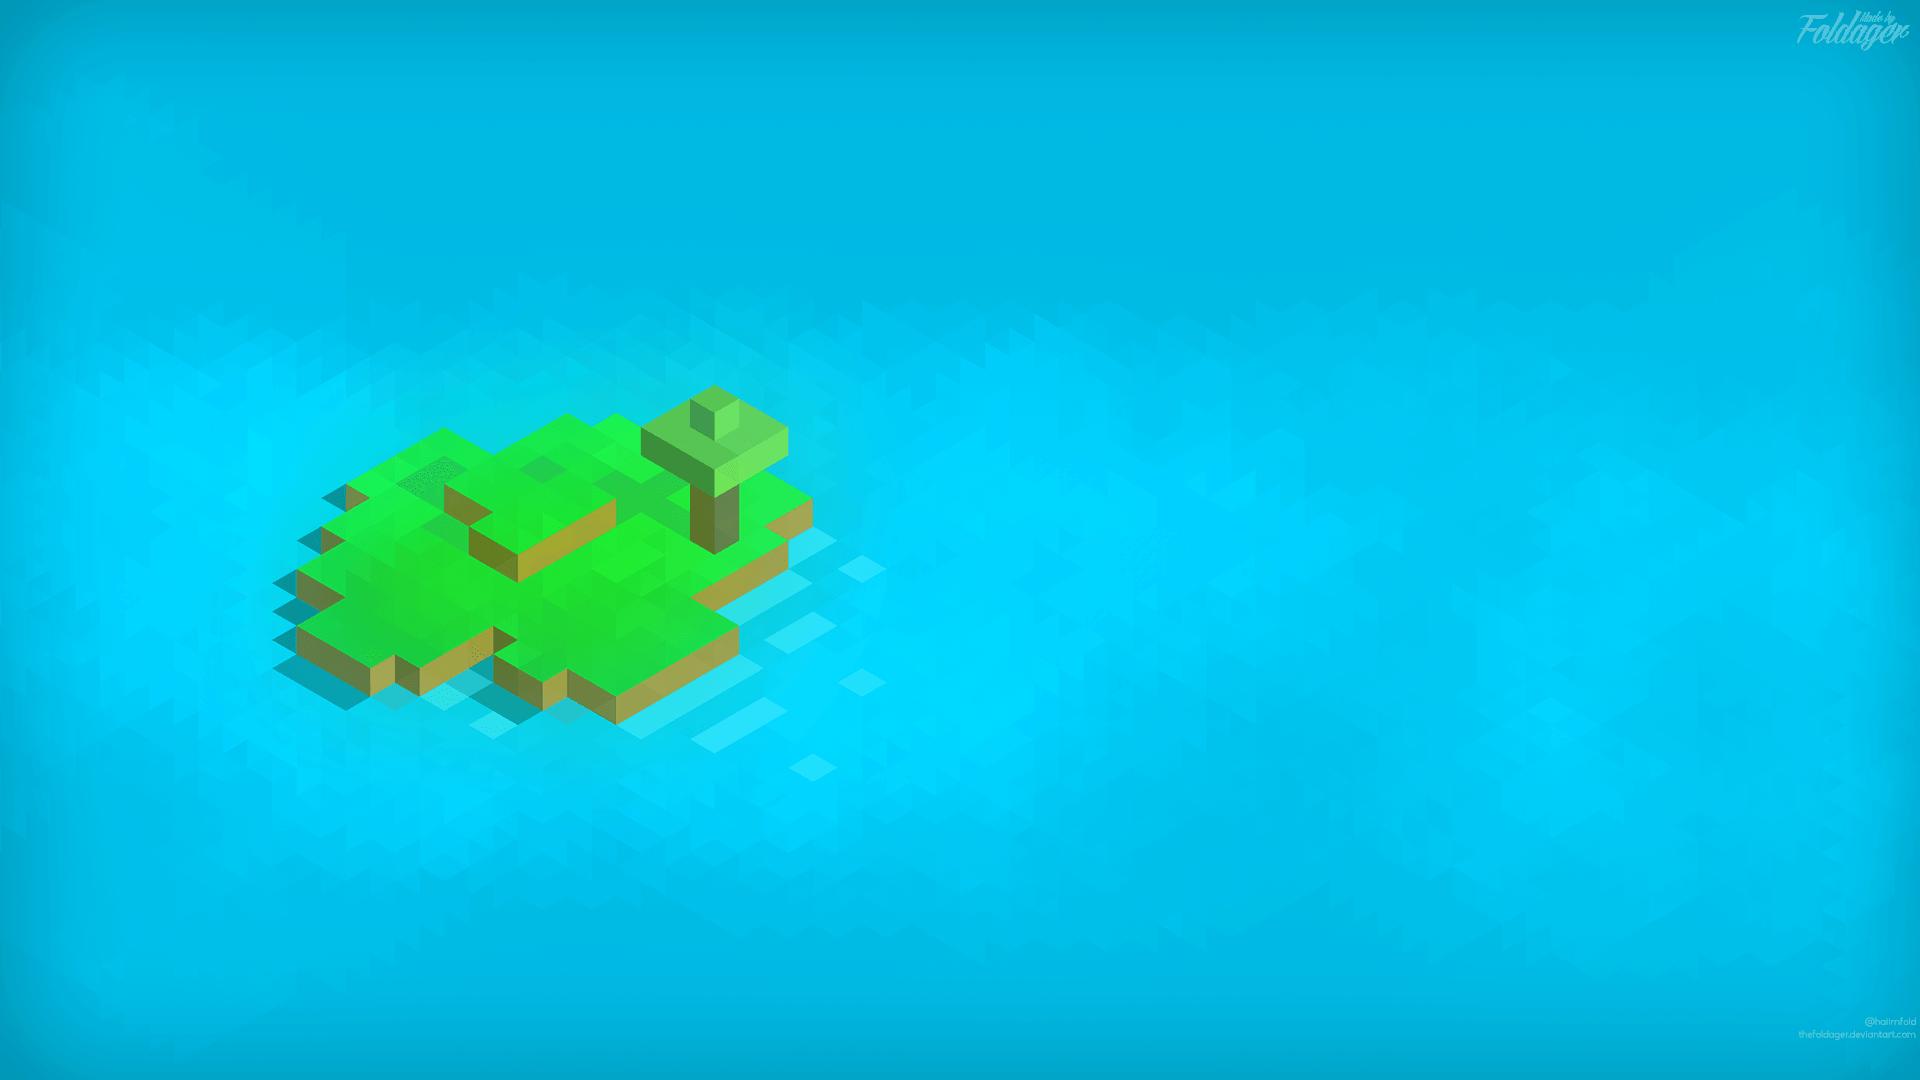 isometric_minecraft_island__hd_1920x1080__by_thefoldager-d8fz2fm